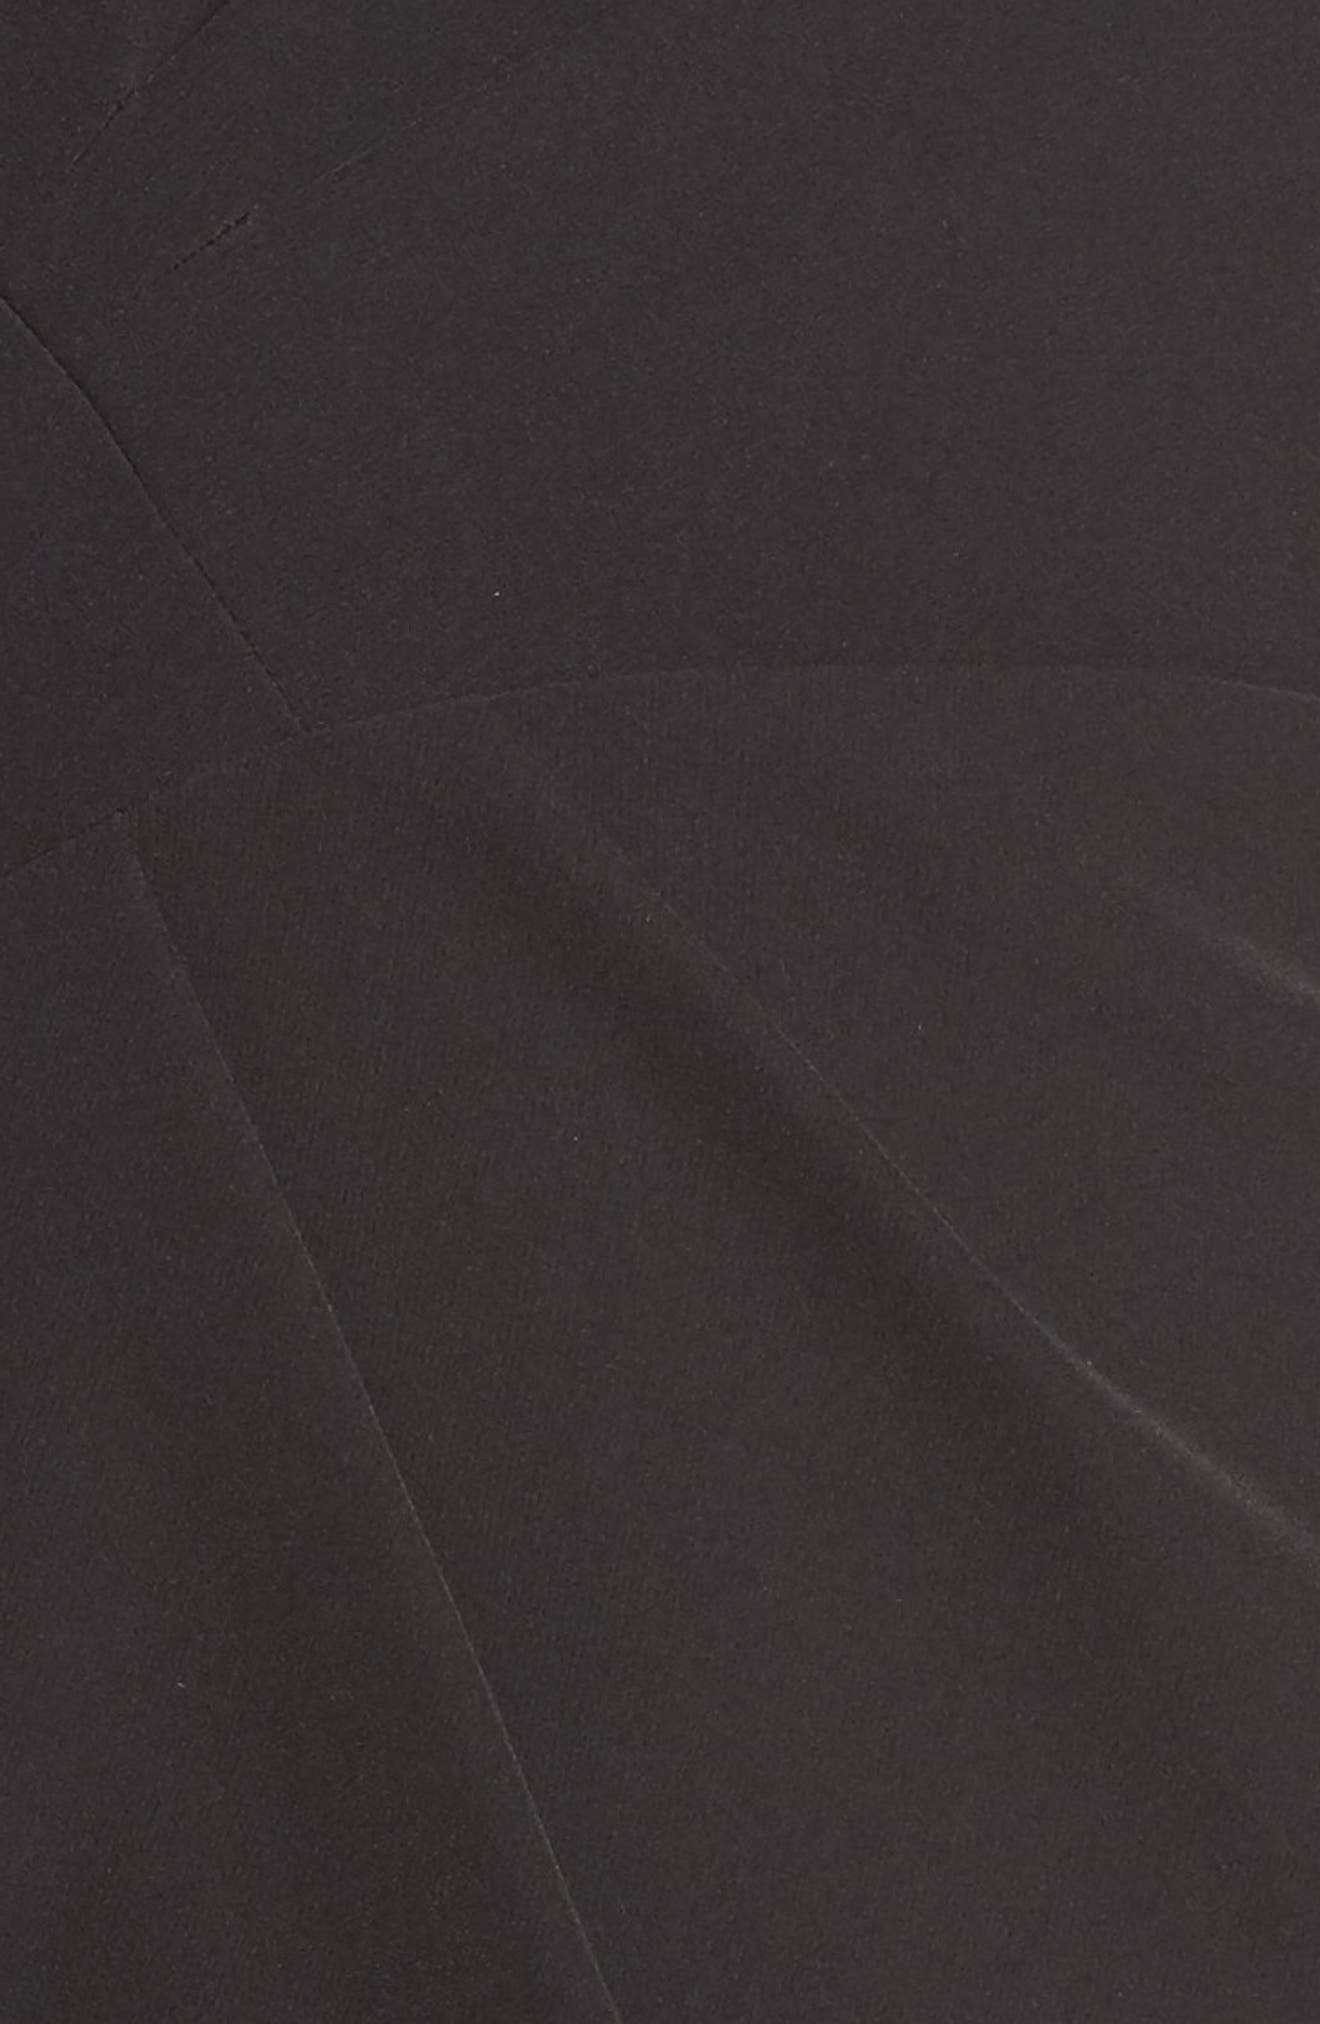 Anja One-Shoulder Sheath Dress,                             Alternate thumbnail 5, color,                             Black